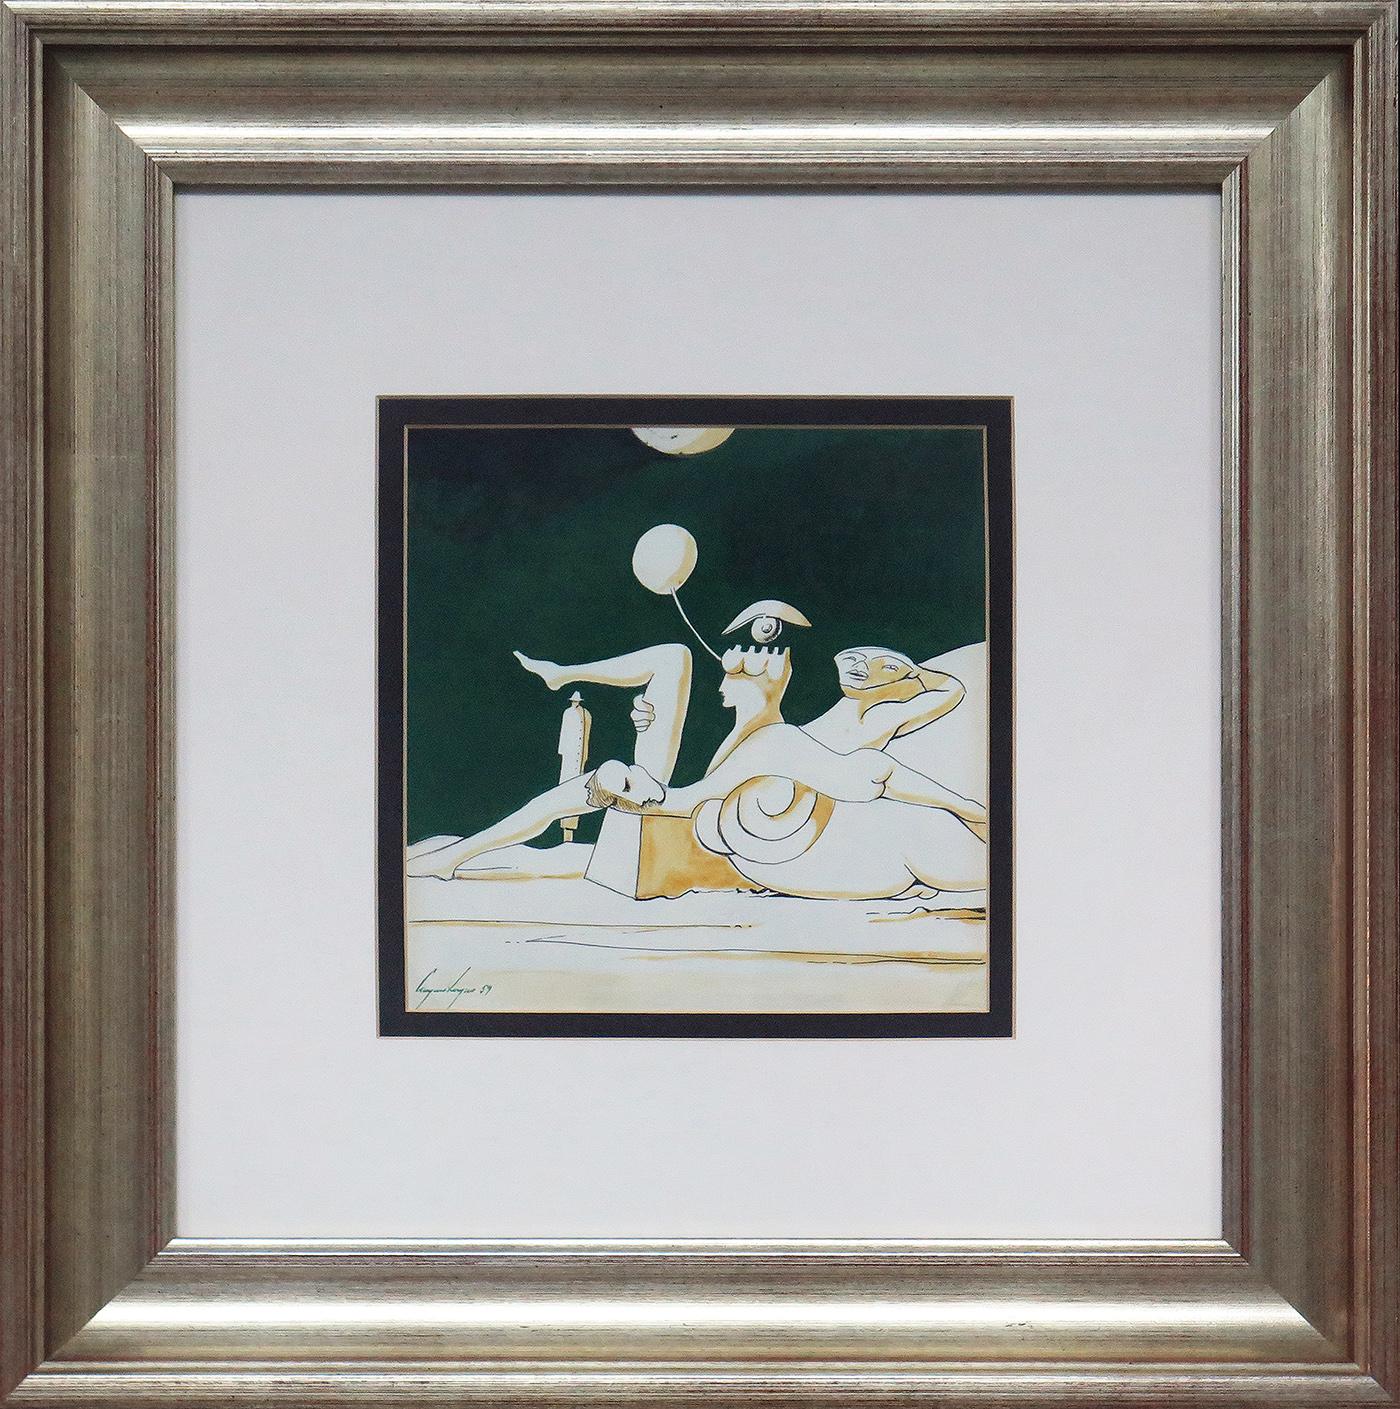 Sem título, técnica mista sobre papel, 21,5 x 21,5 cm, 1959